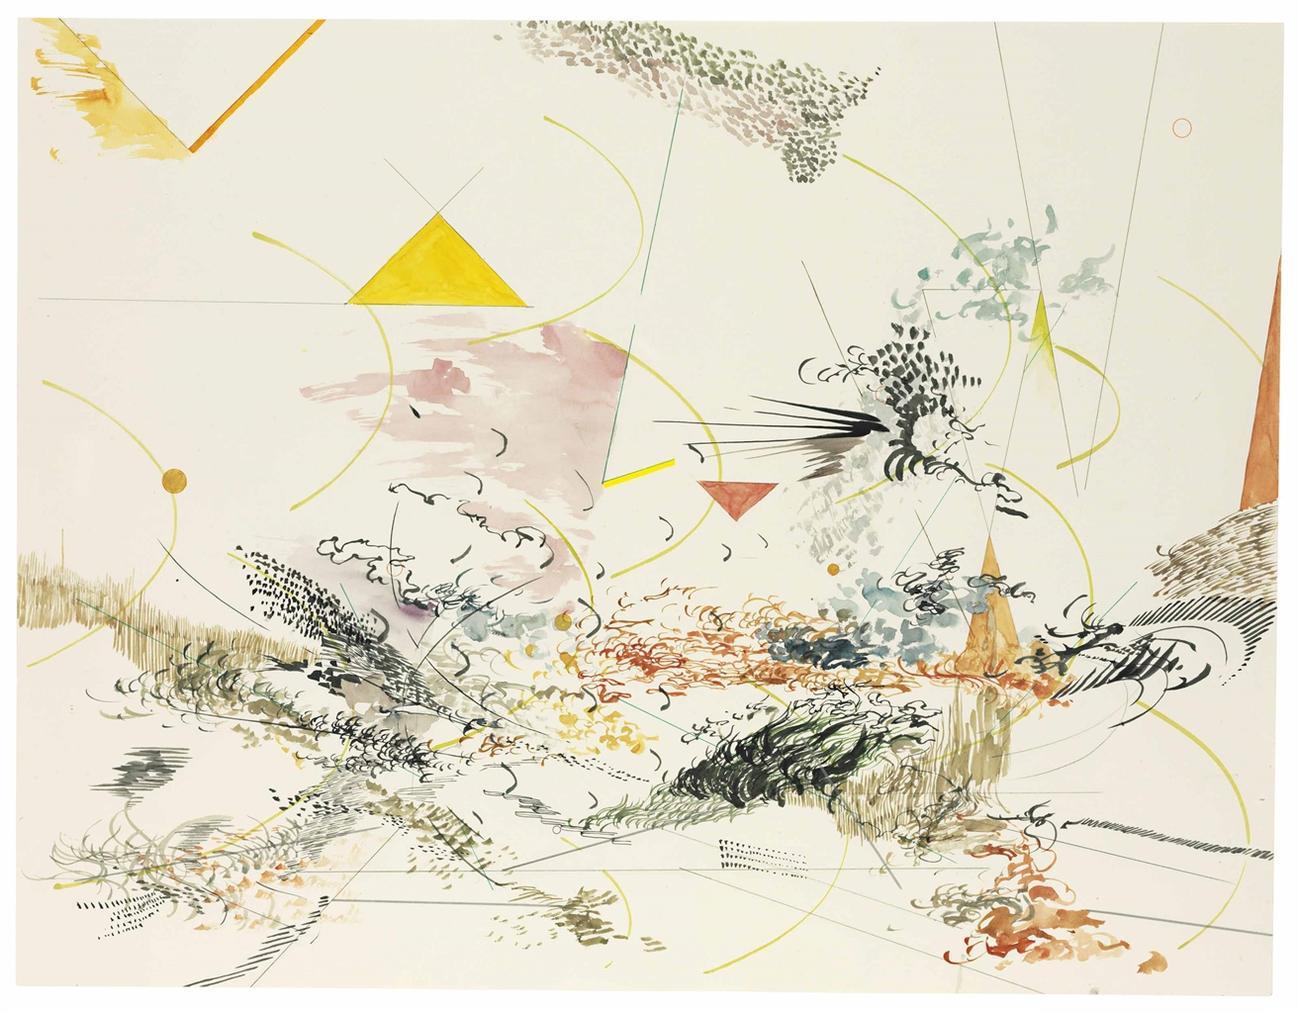 Julie Mehretu-Untitled-2006